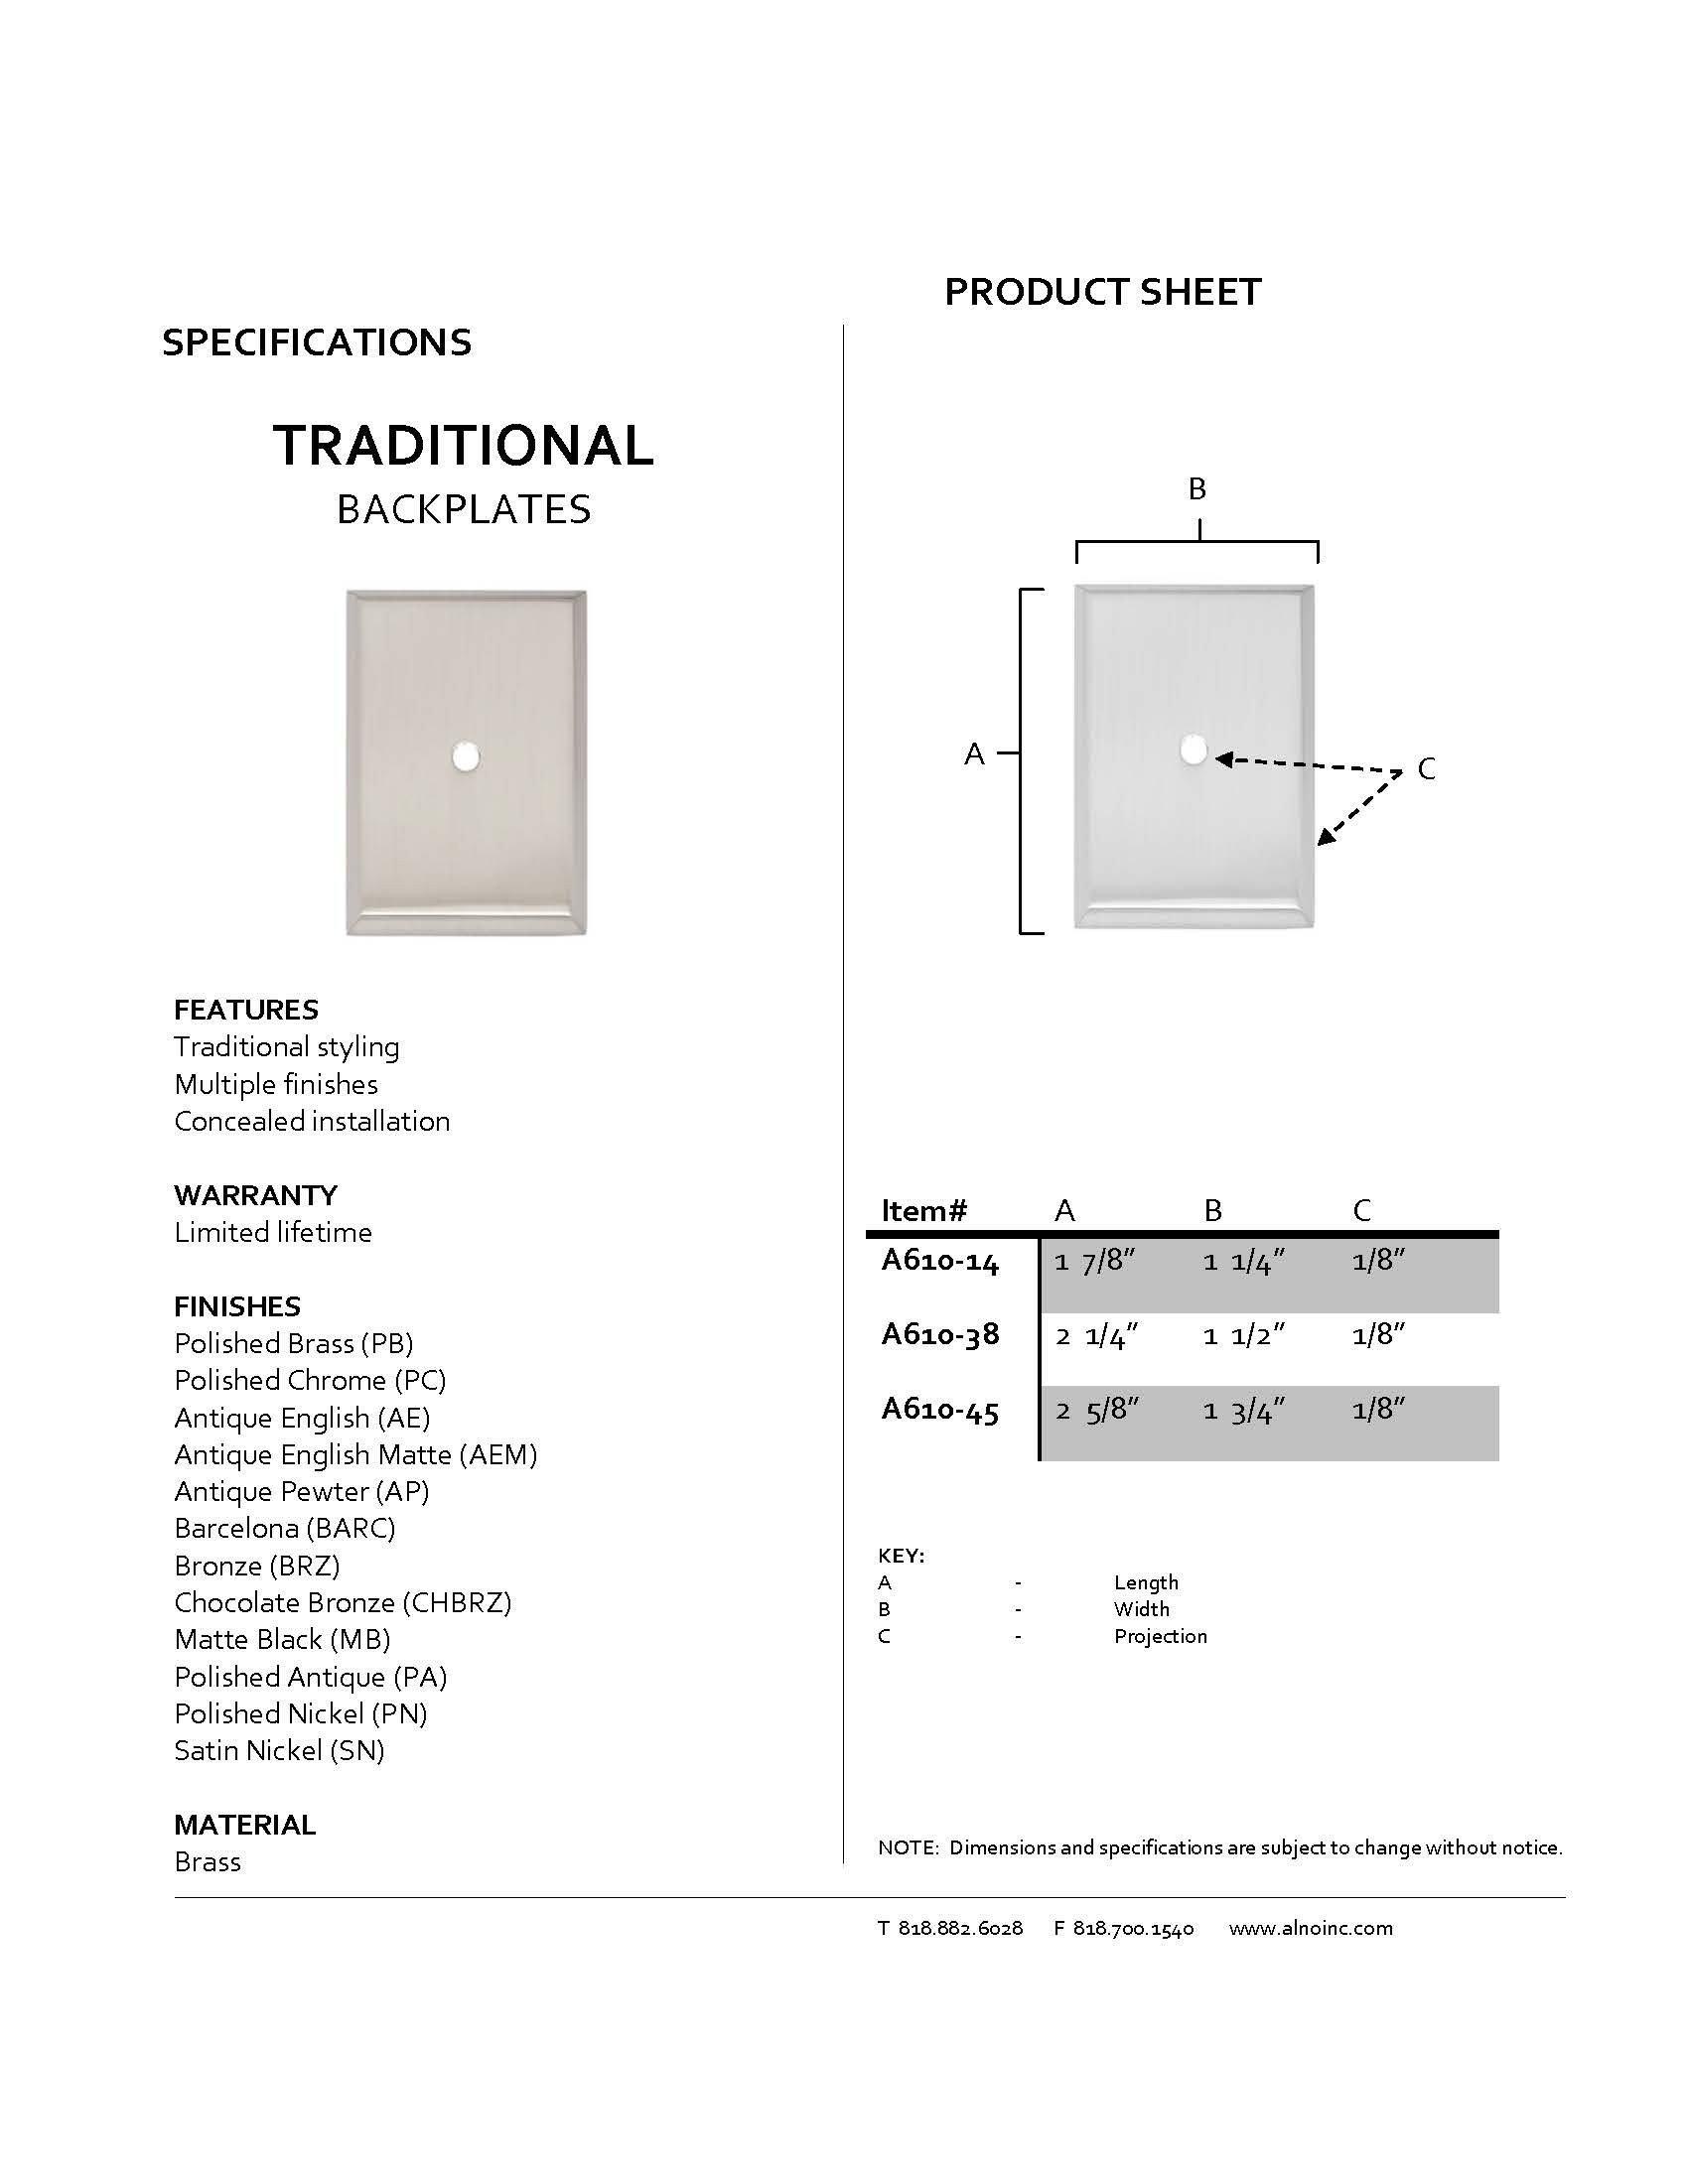 Alno A610-38-PN Escutcheon Traditional Backplates, Polished Nickel, 2-1/4''